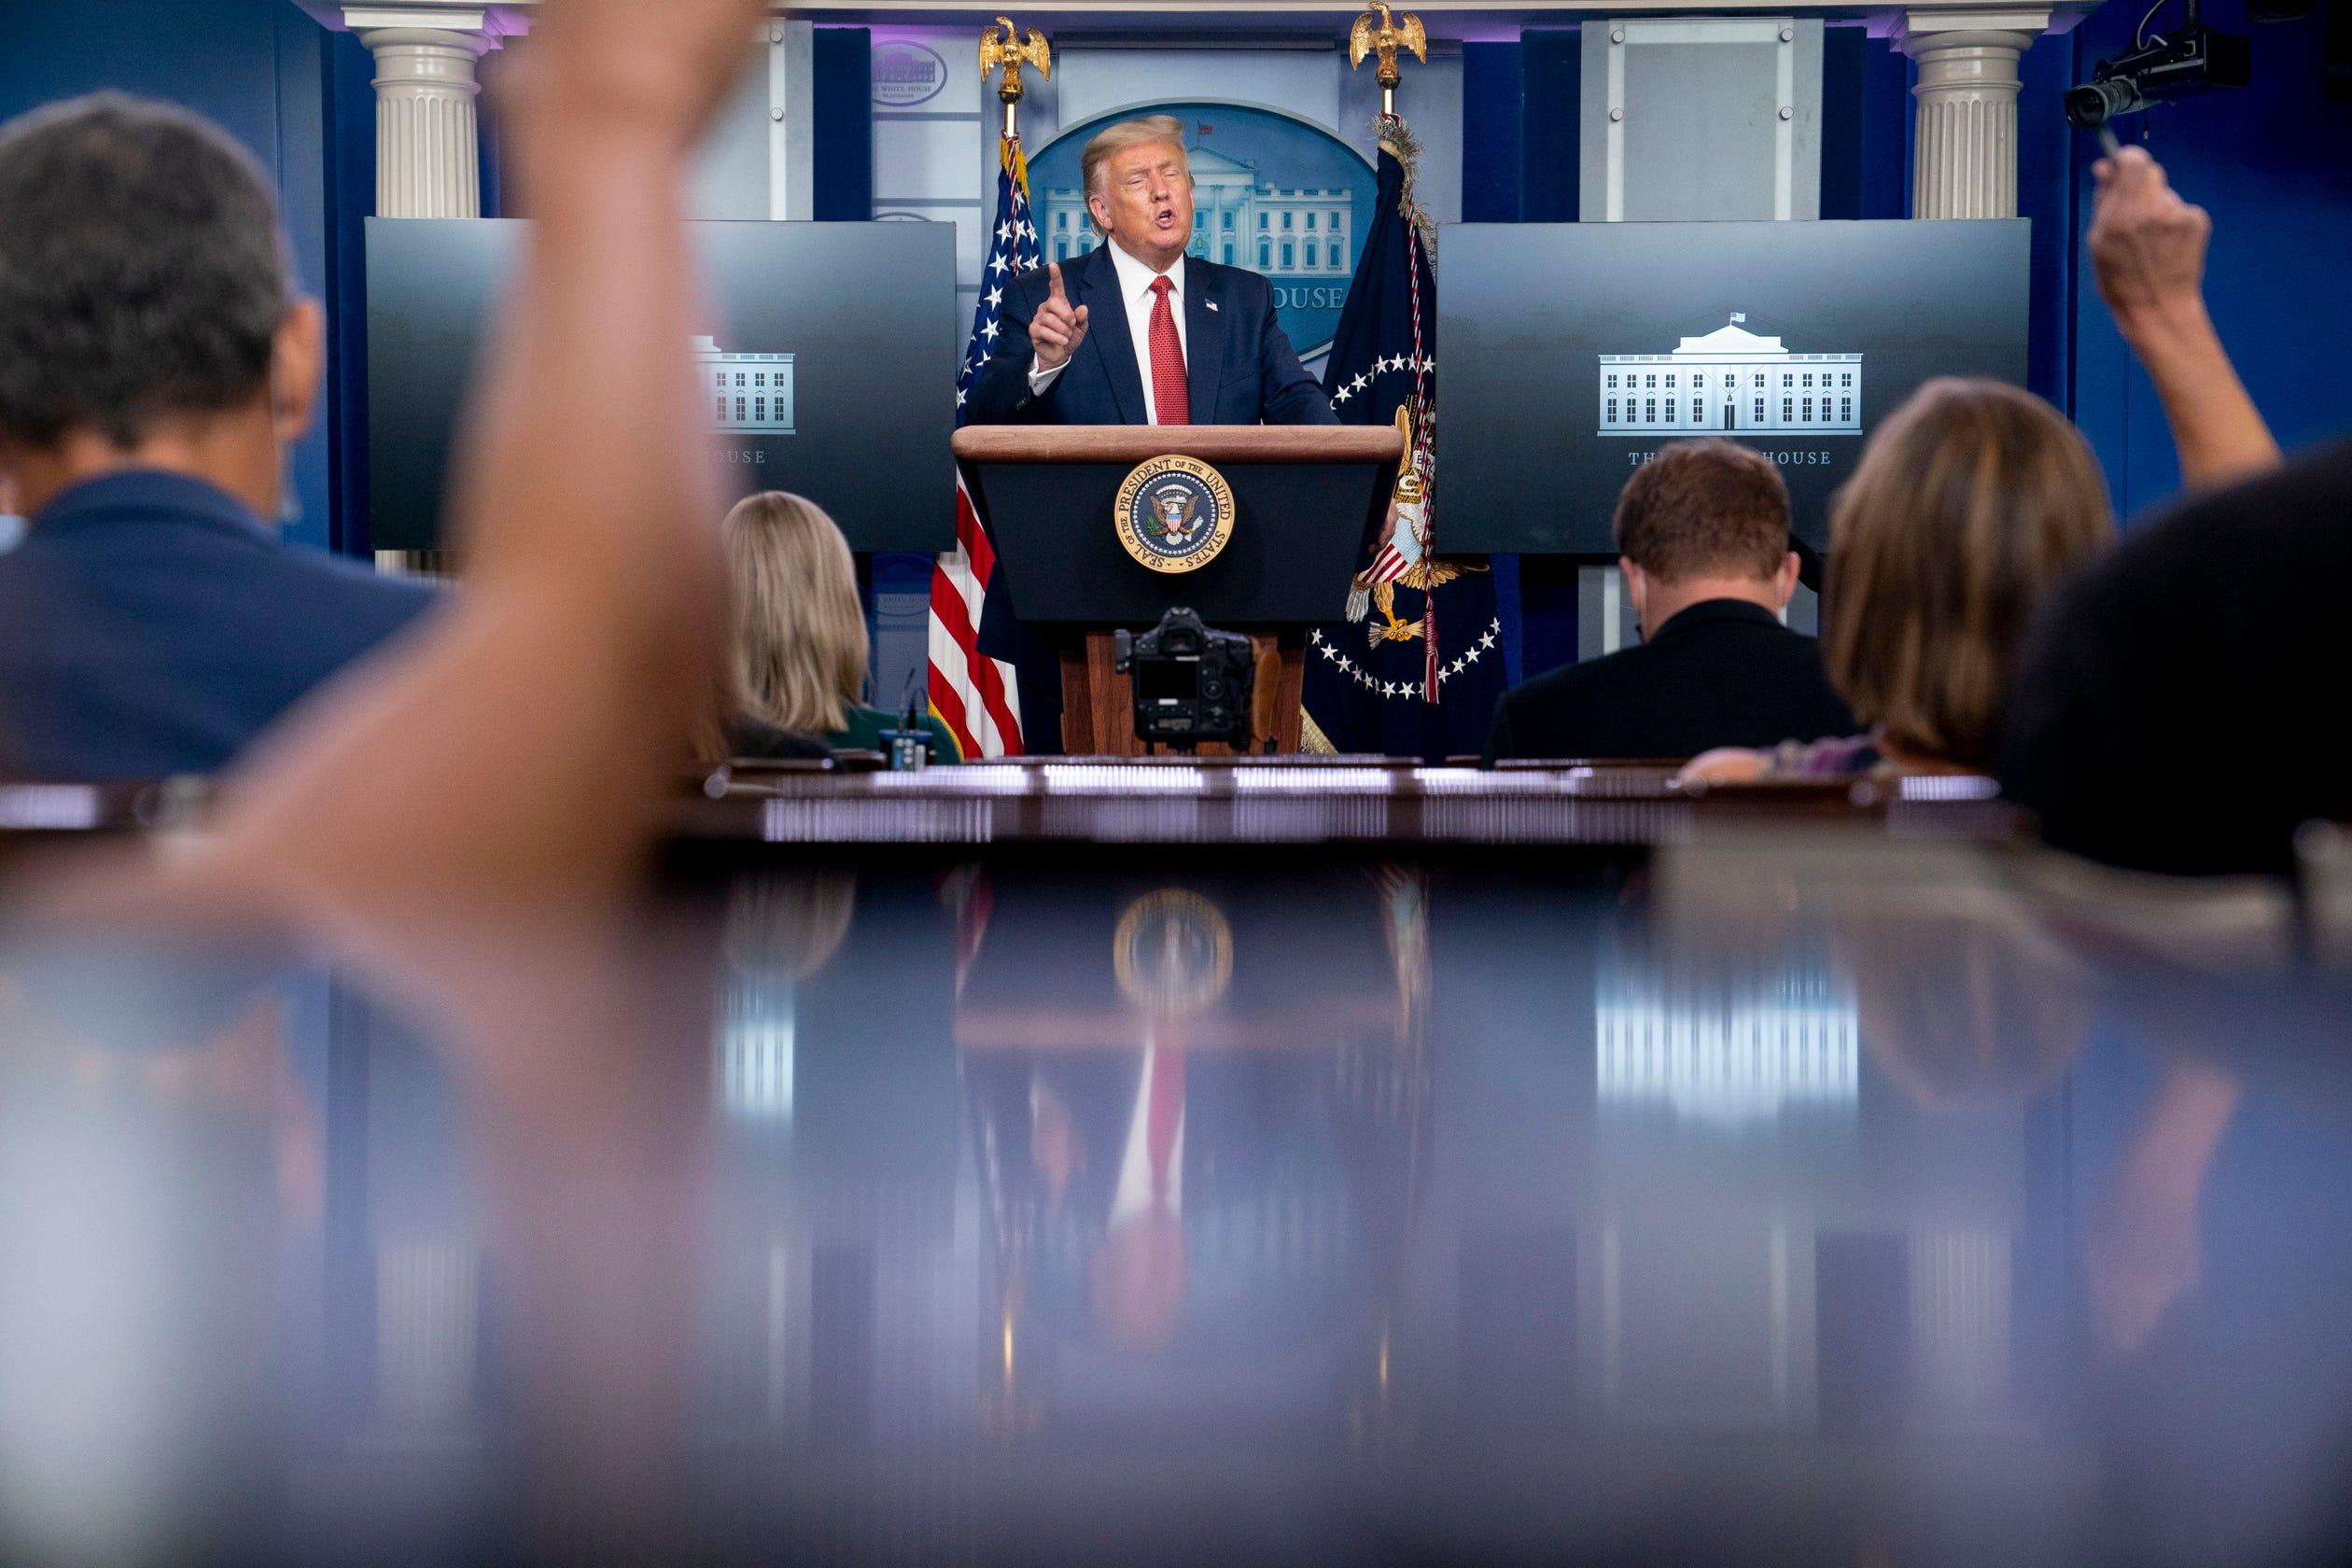 Critics slam Trump 'suburban housewife' tweet as racist, sexist 'dog scream' play for white voters thumbnail